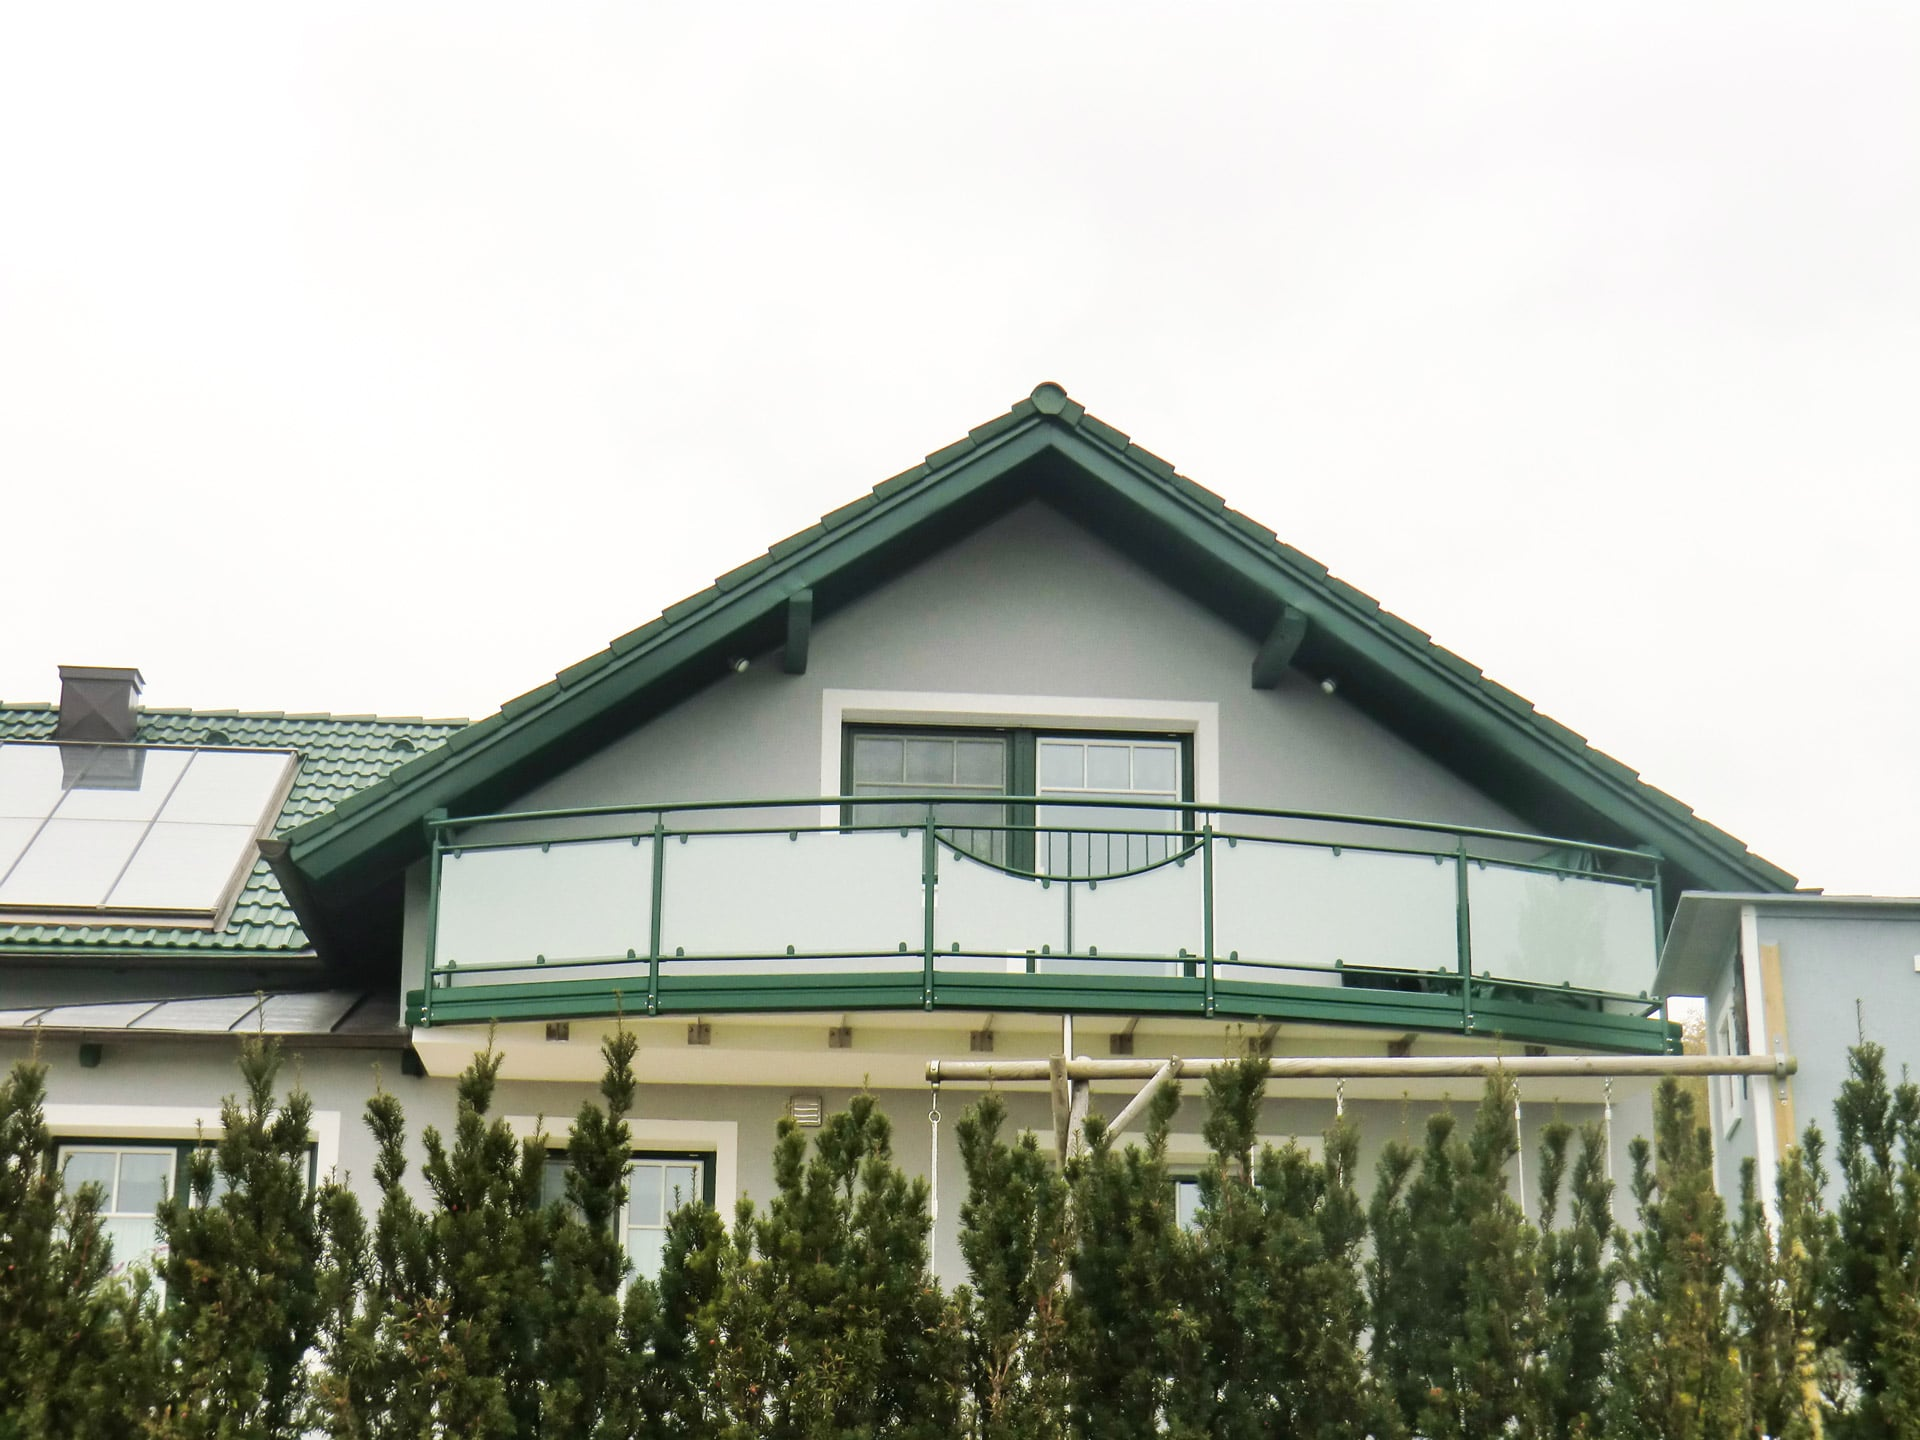 Feldkirch 01 | Aluminium-Balkon mit Glasfüllung matt, stirnseitig montiert, Blende, grün | Svoboda